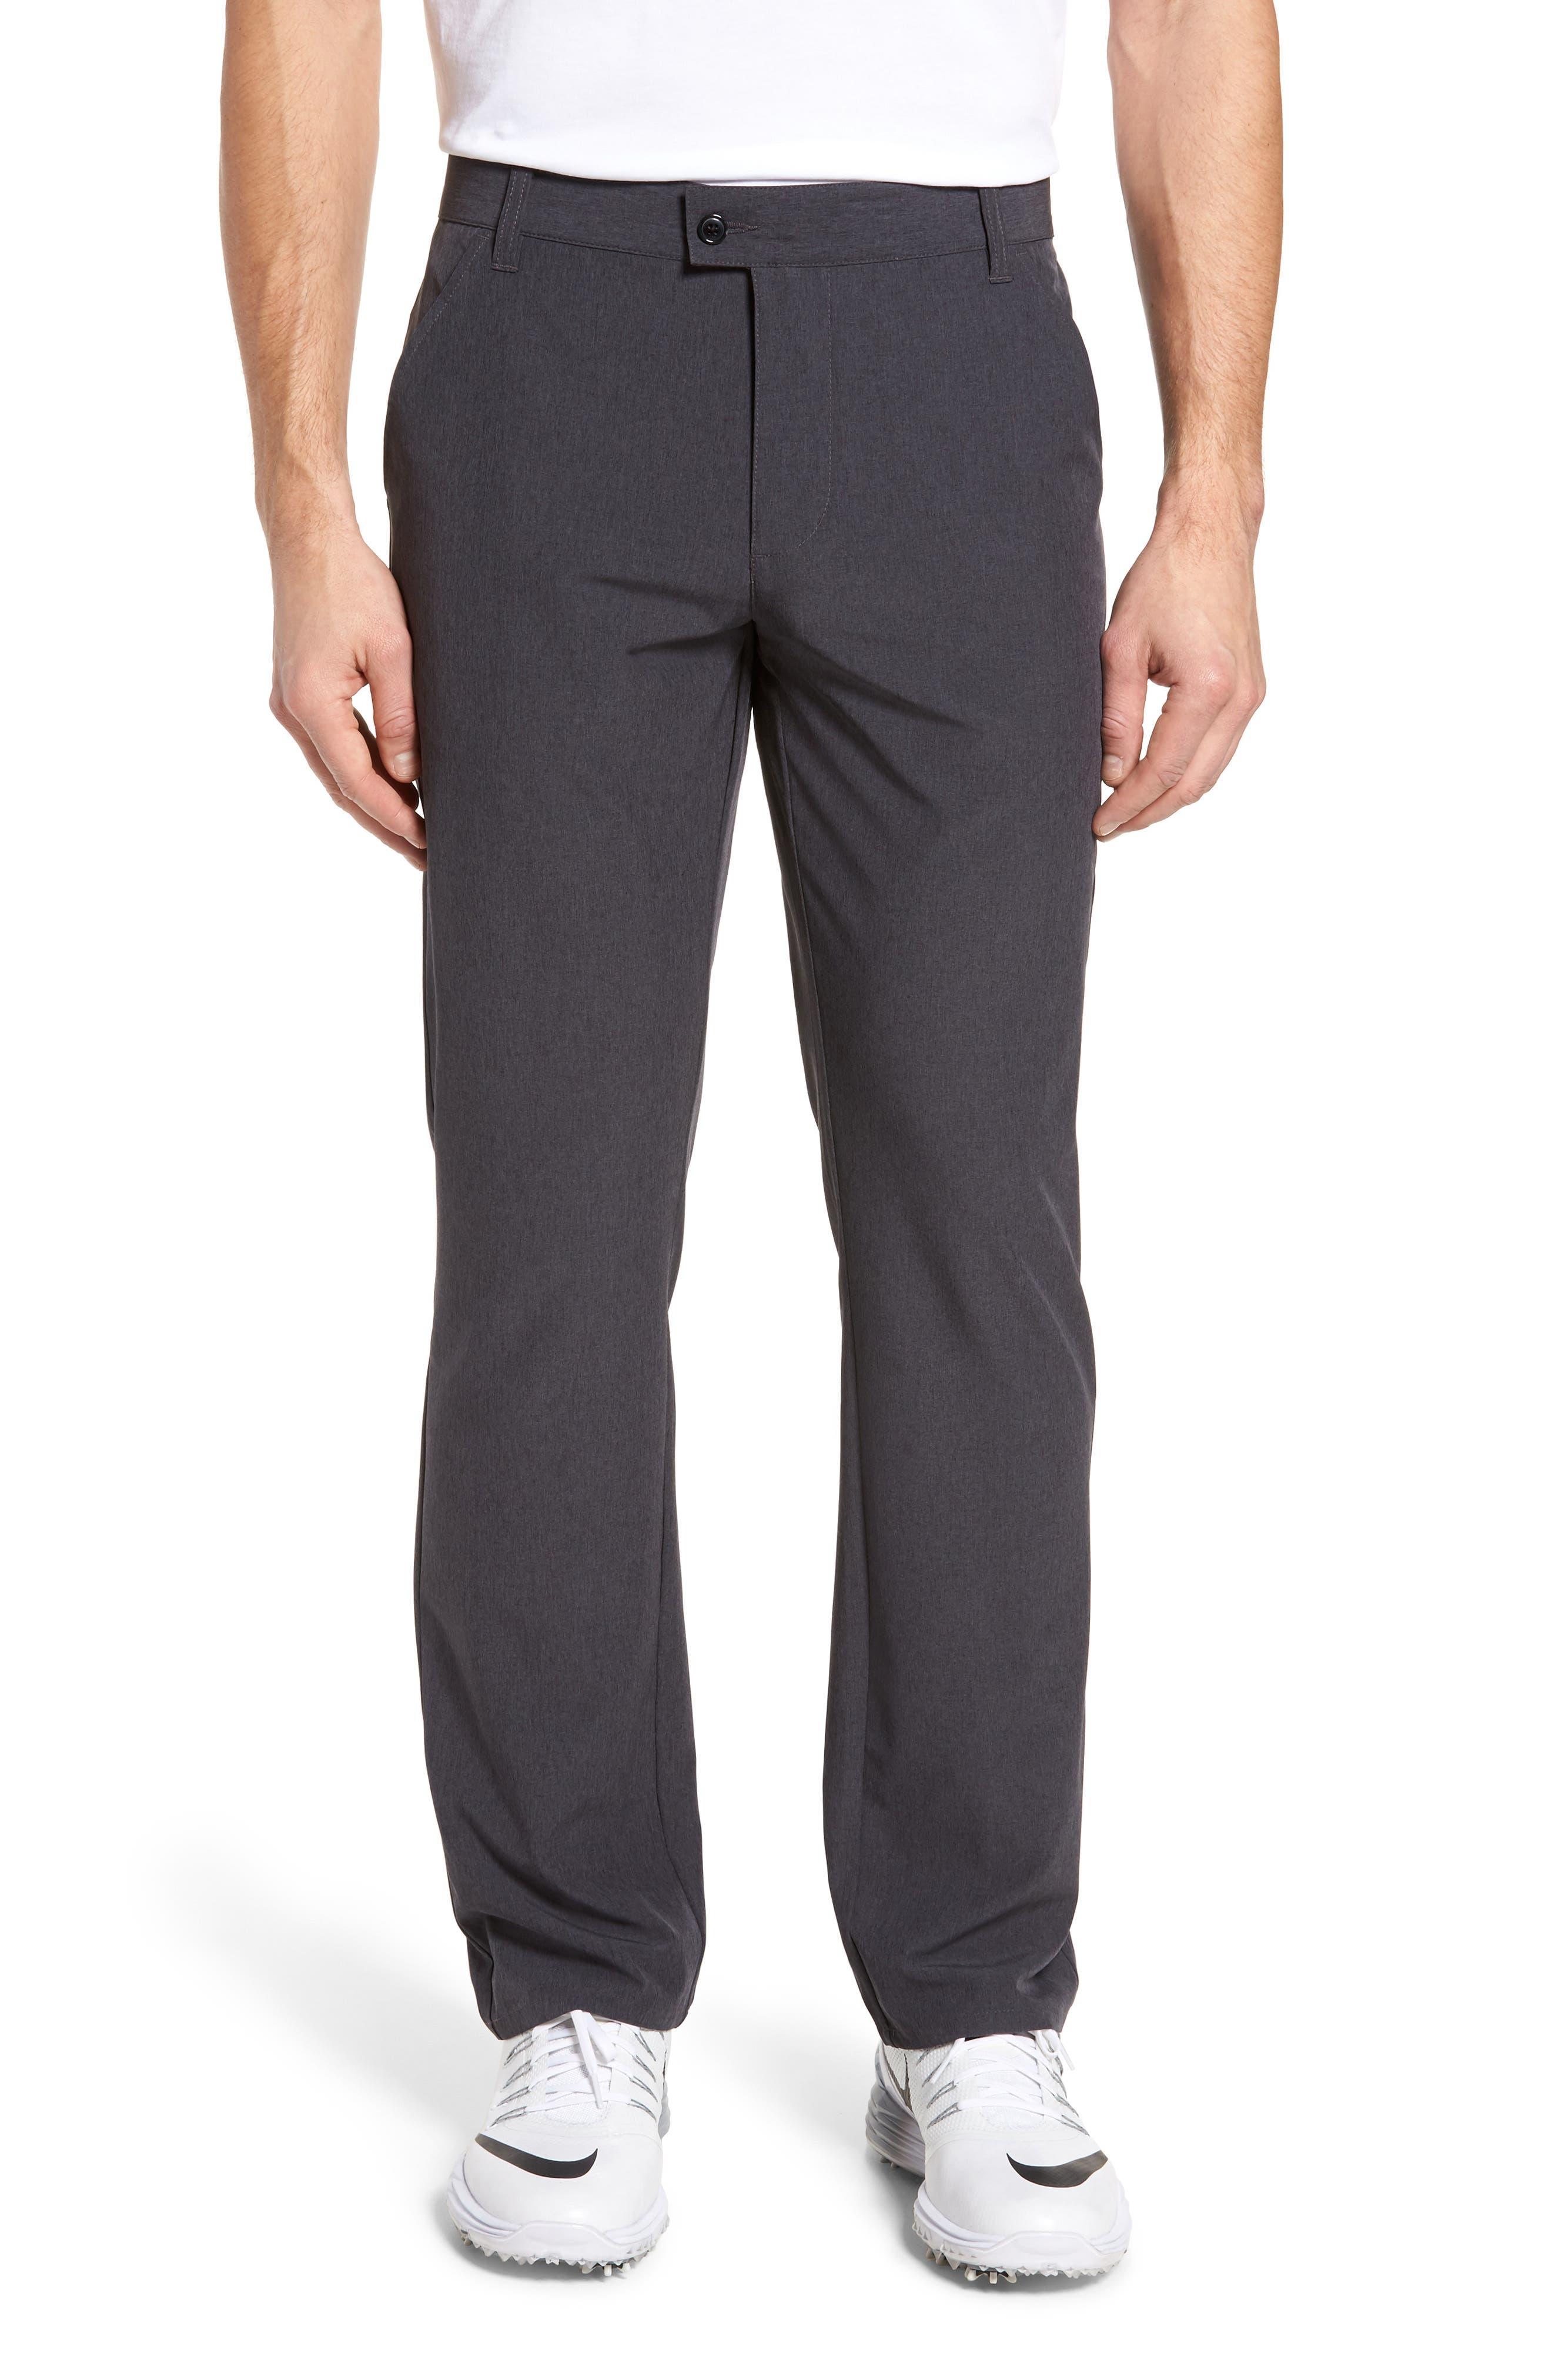 Pantladdium Pants,                         Main,                         color, Heather Black